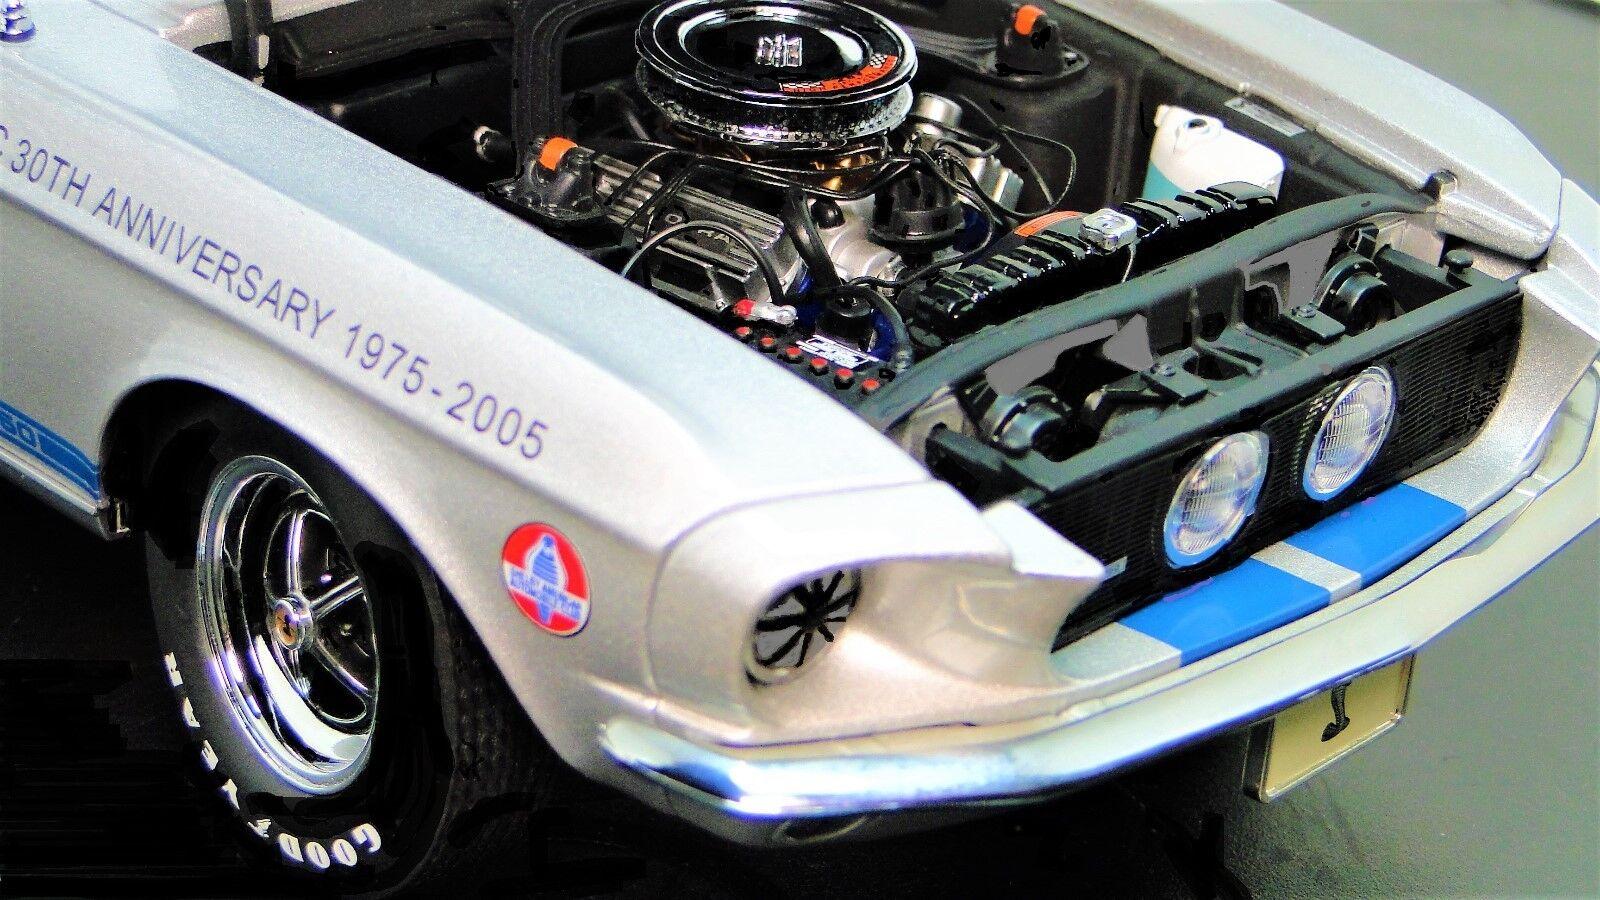 Mustang 1967 Lane Exact Detail Detail Detail Ford Race Car 1 GT 18 24 Vintage 40 Racing 12 be576a